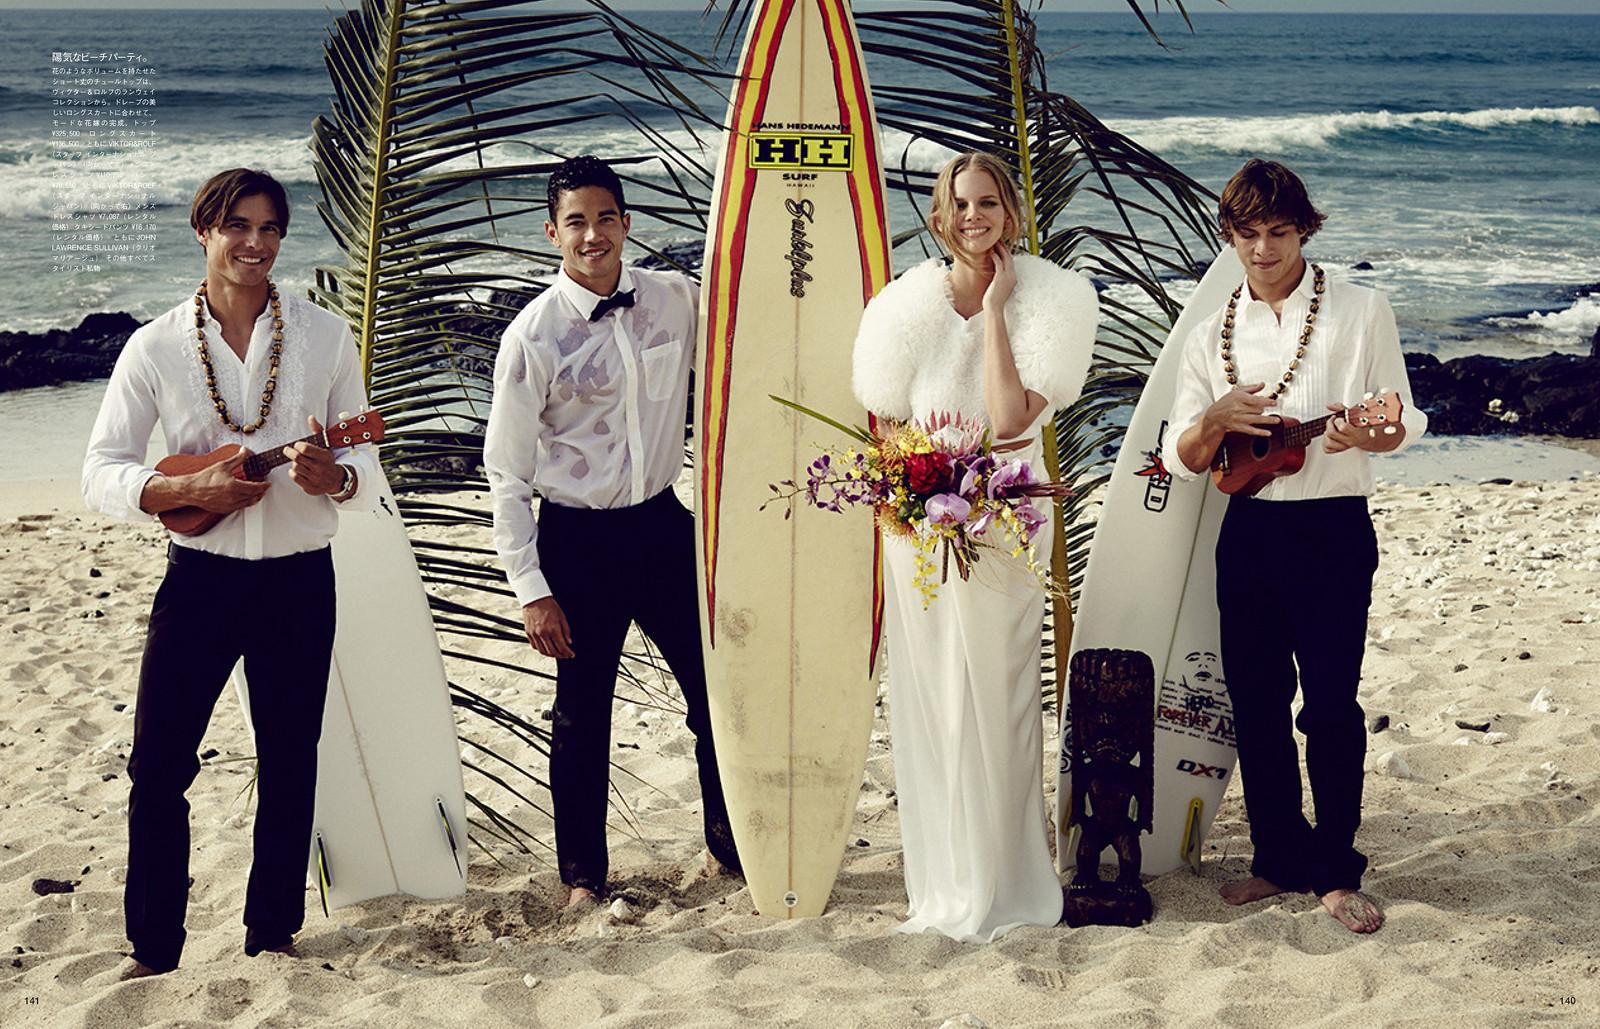 Wedding_ハワイ島_追加訂正-7-X3.jpg